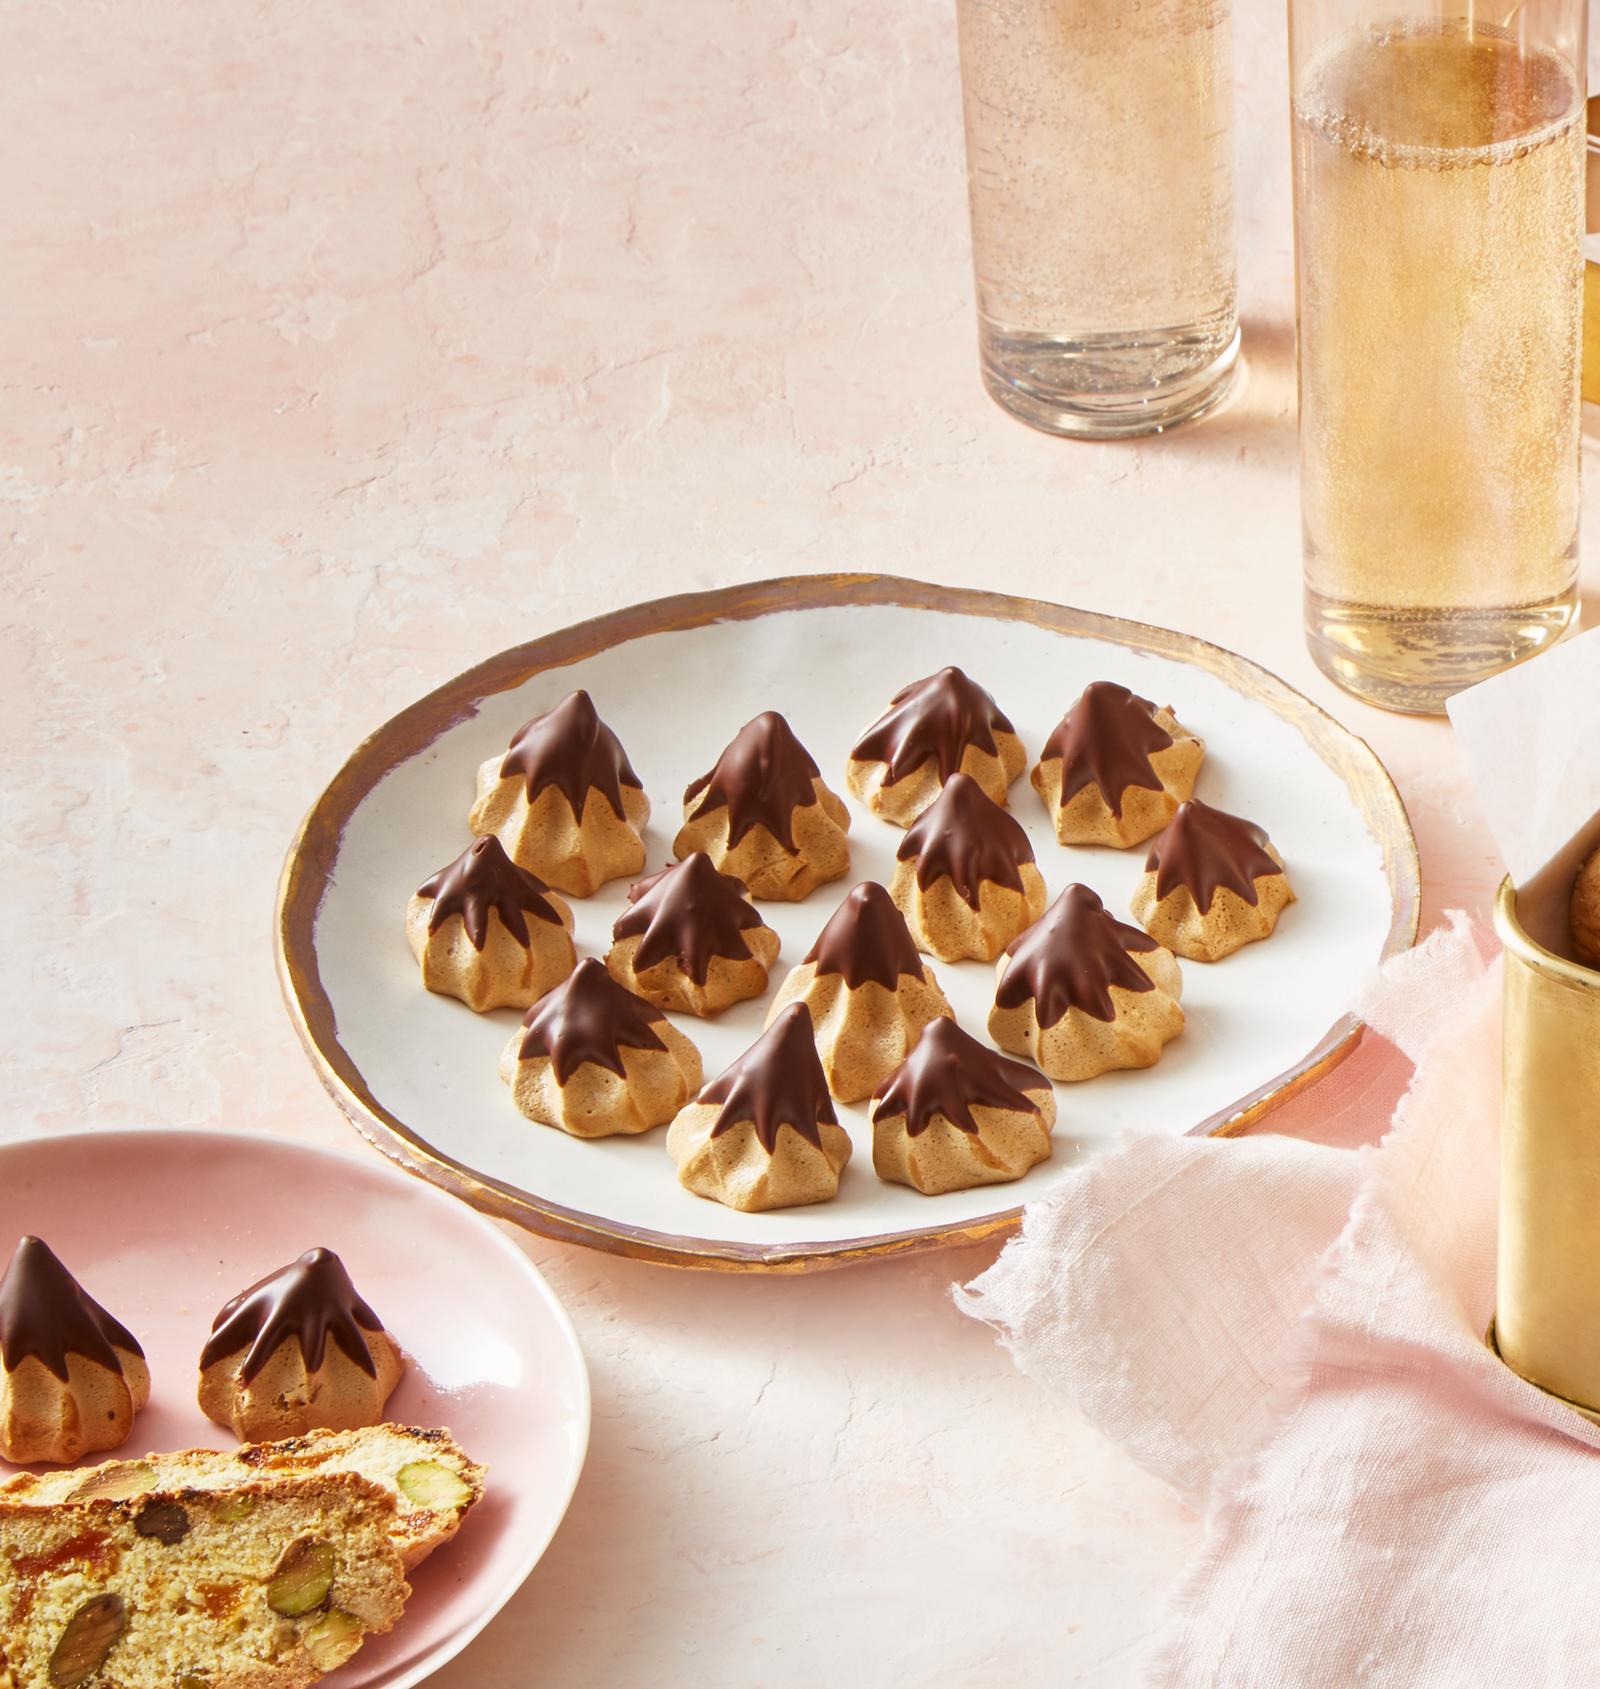 16 Insanely Healthy Recipes That Are Delicious: Mocha Meringue Cookies